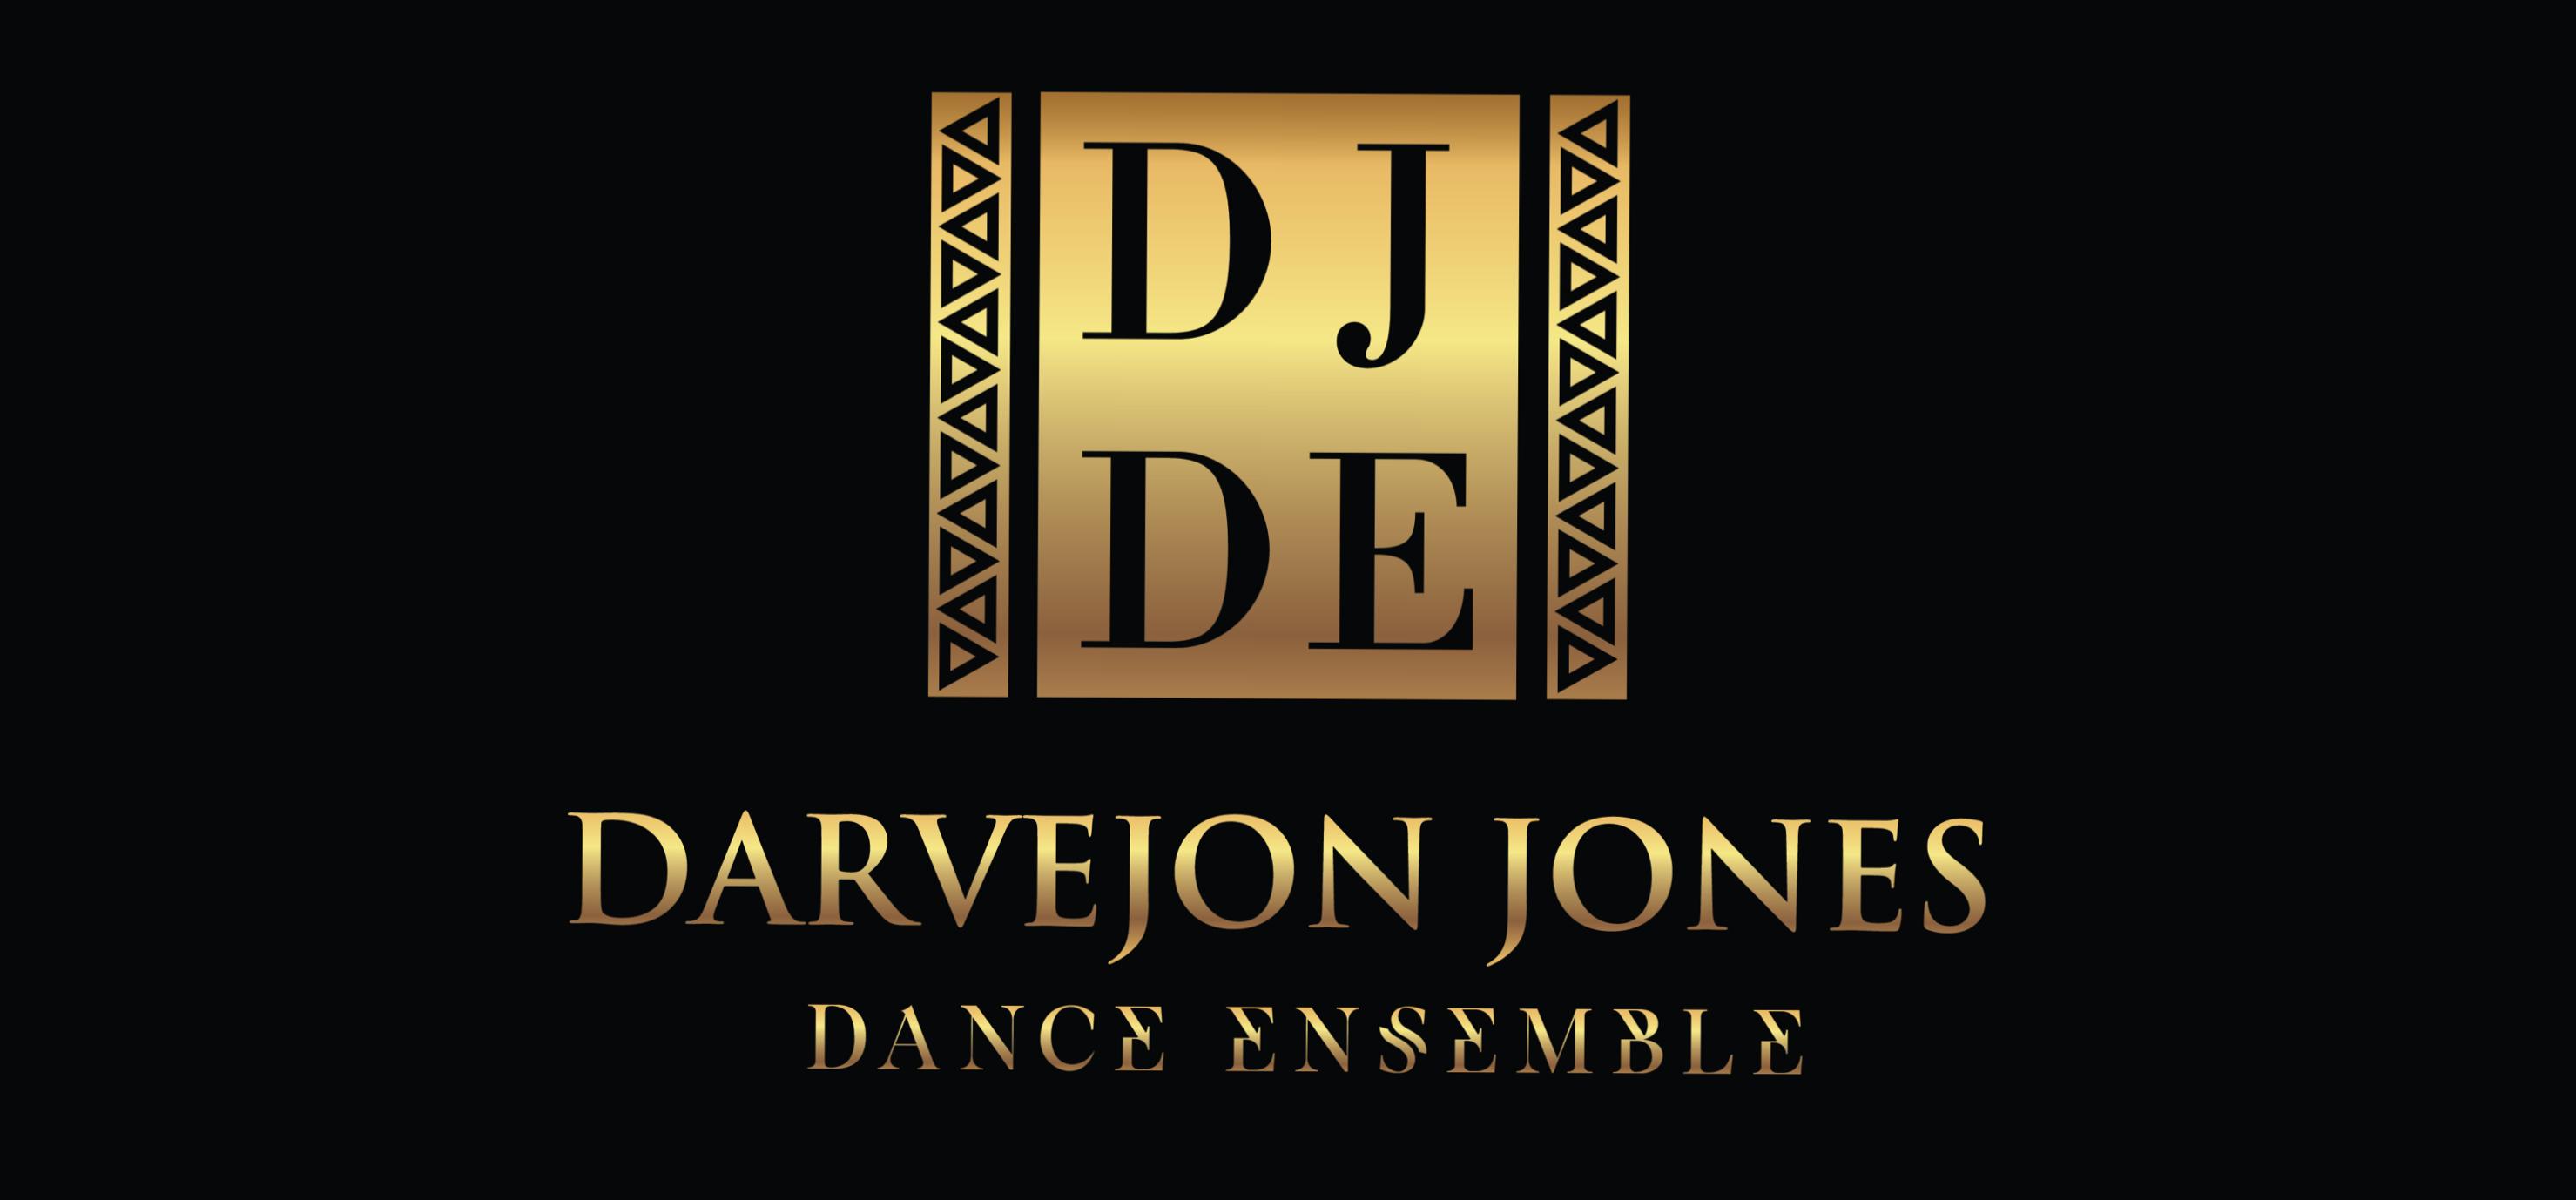 Darvejon Jones Dance Ensemble